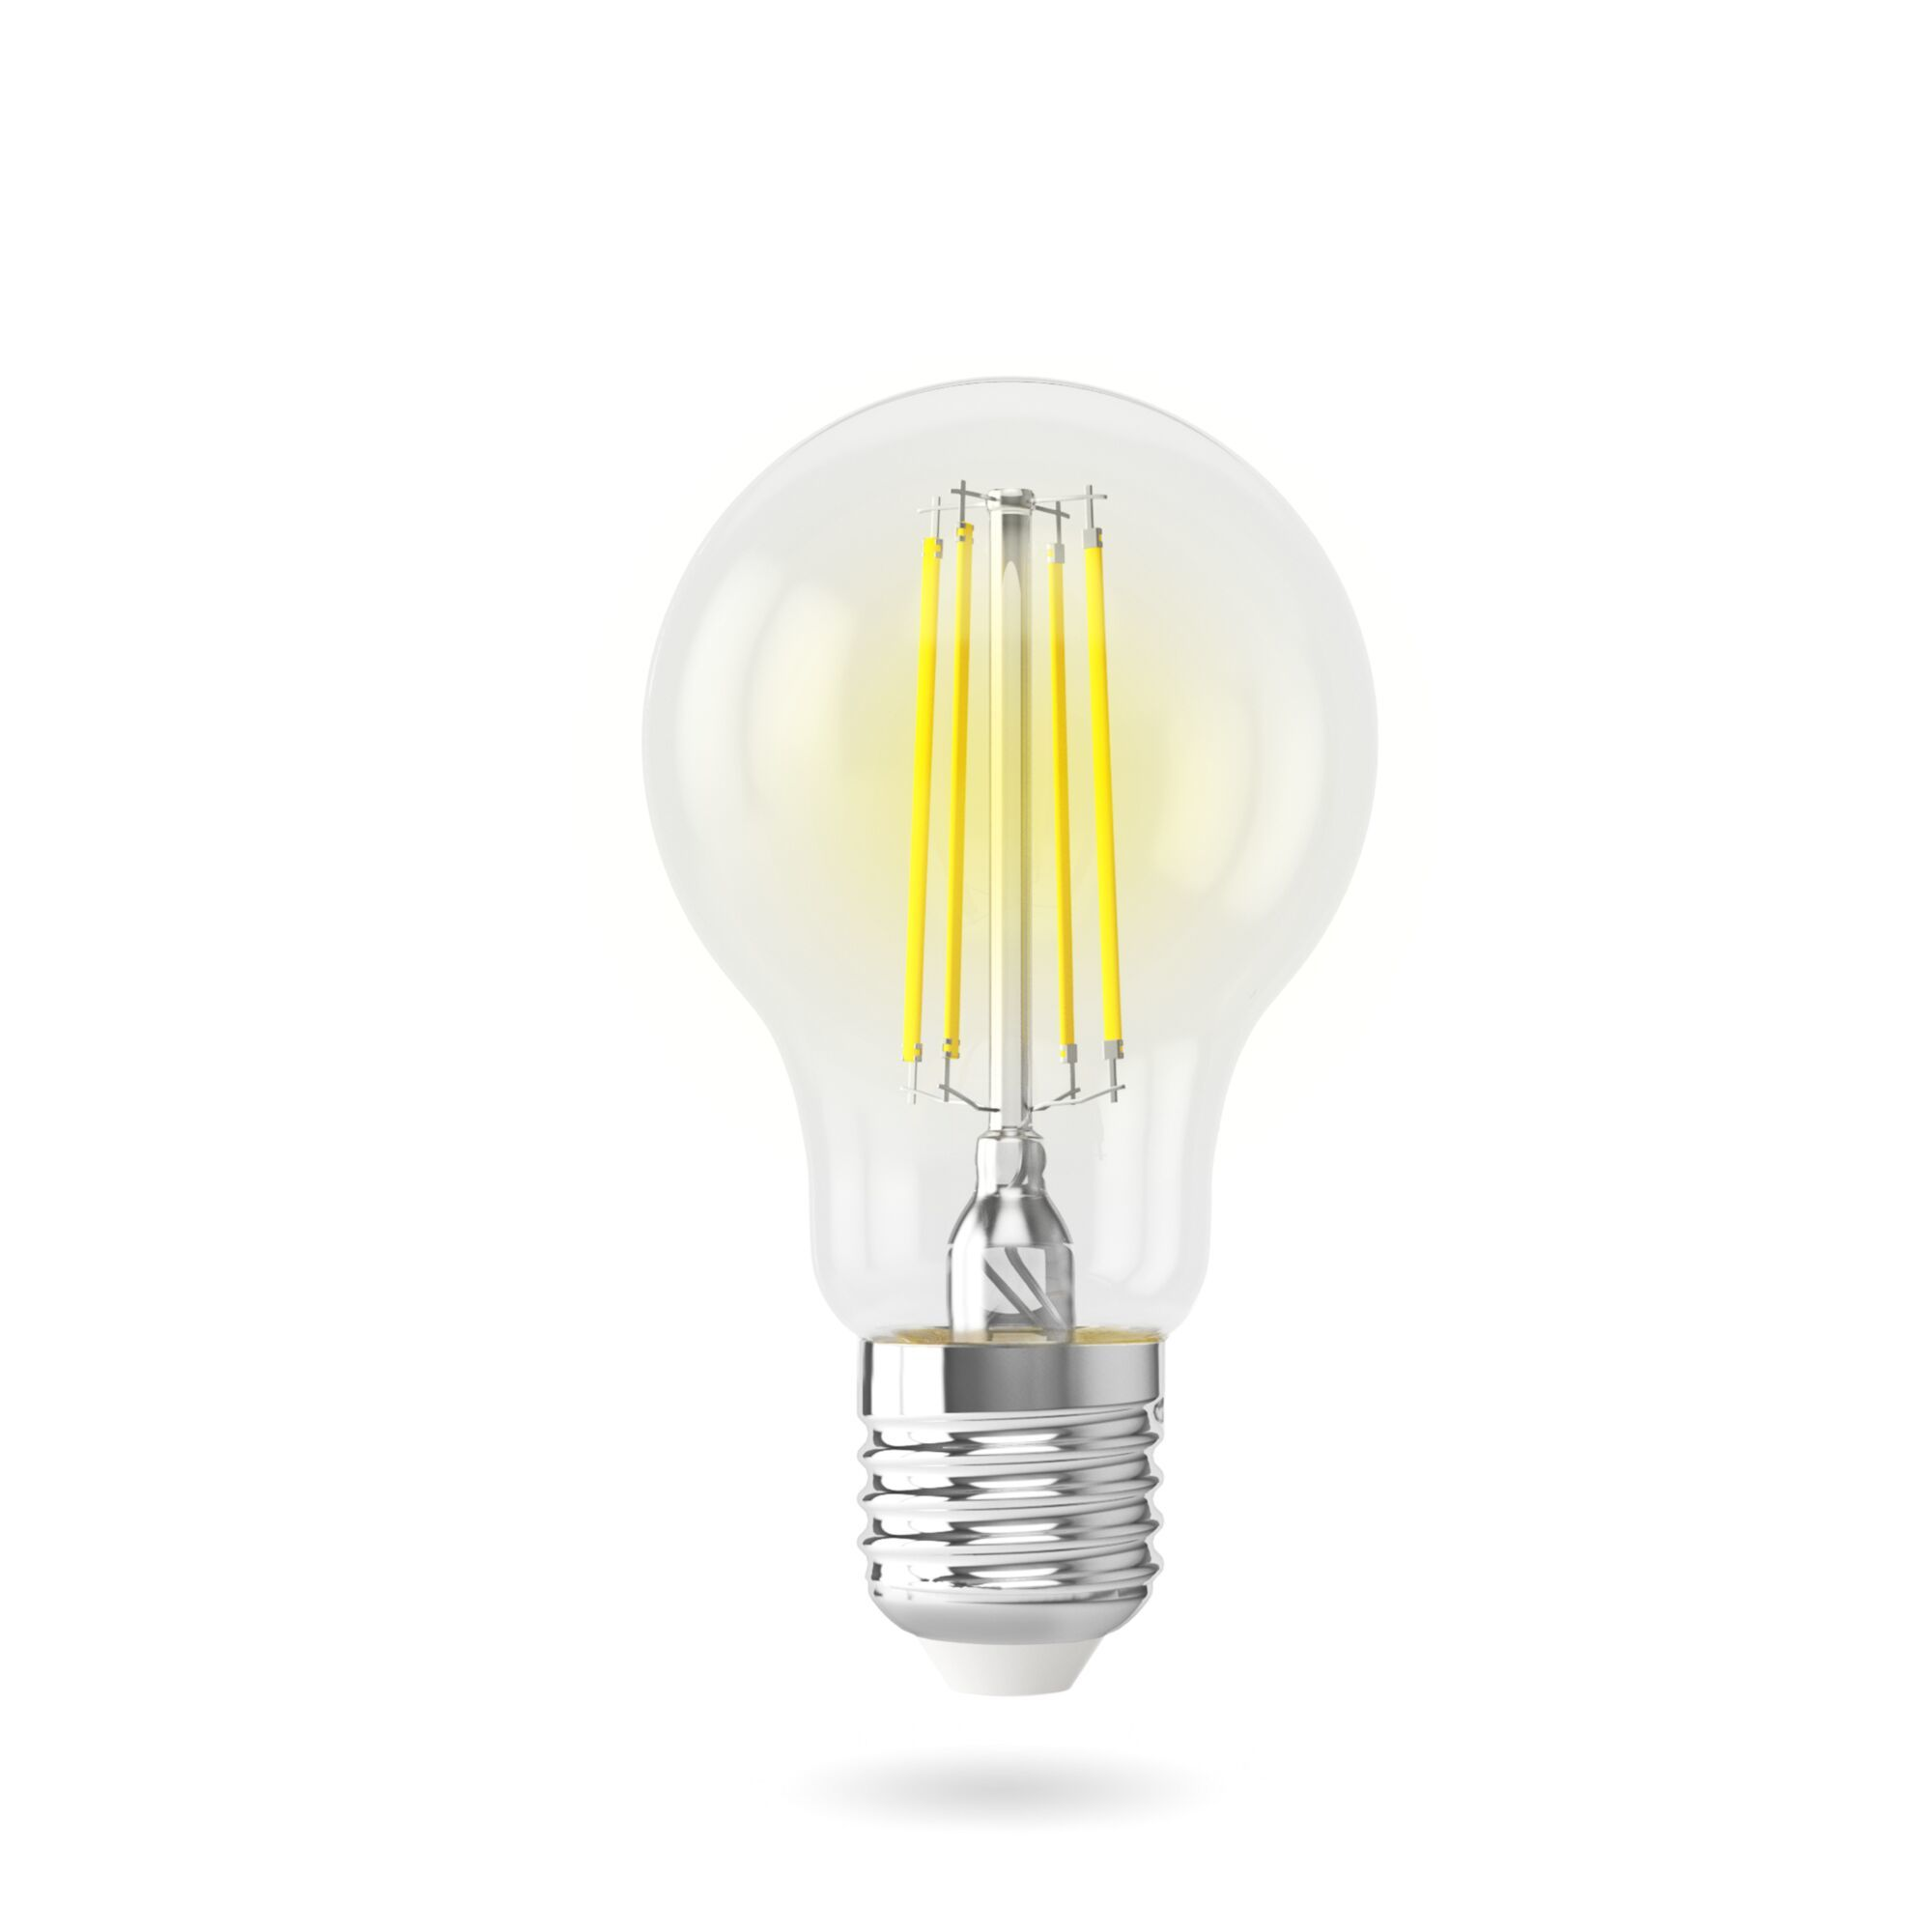 Филаментная светодиодная лампа Voltega Crystal 7141 груша E27 7W, 4000K 220V, гарантия 3 года - фото 1